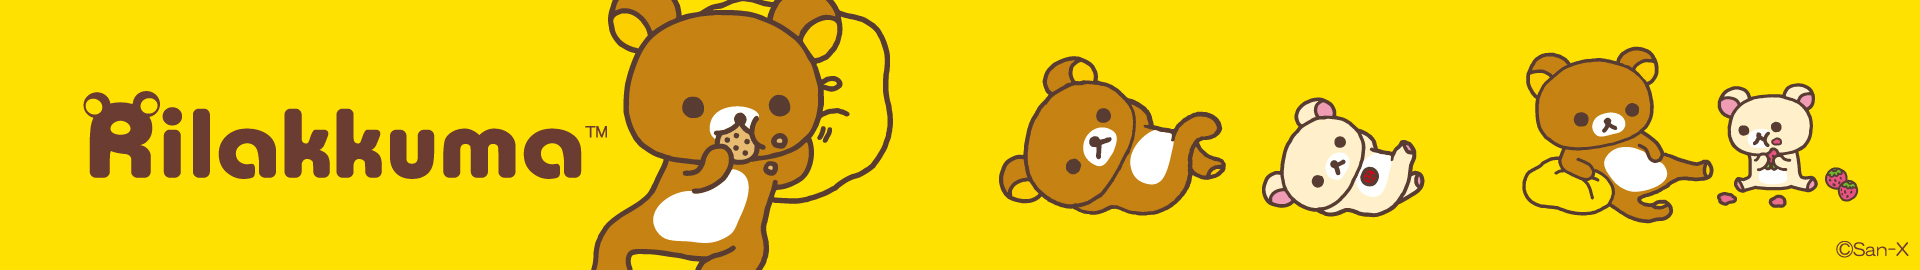 rilakkuma-teddy-bear-plush-banner-.jpg